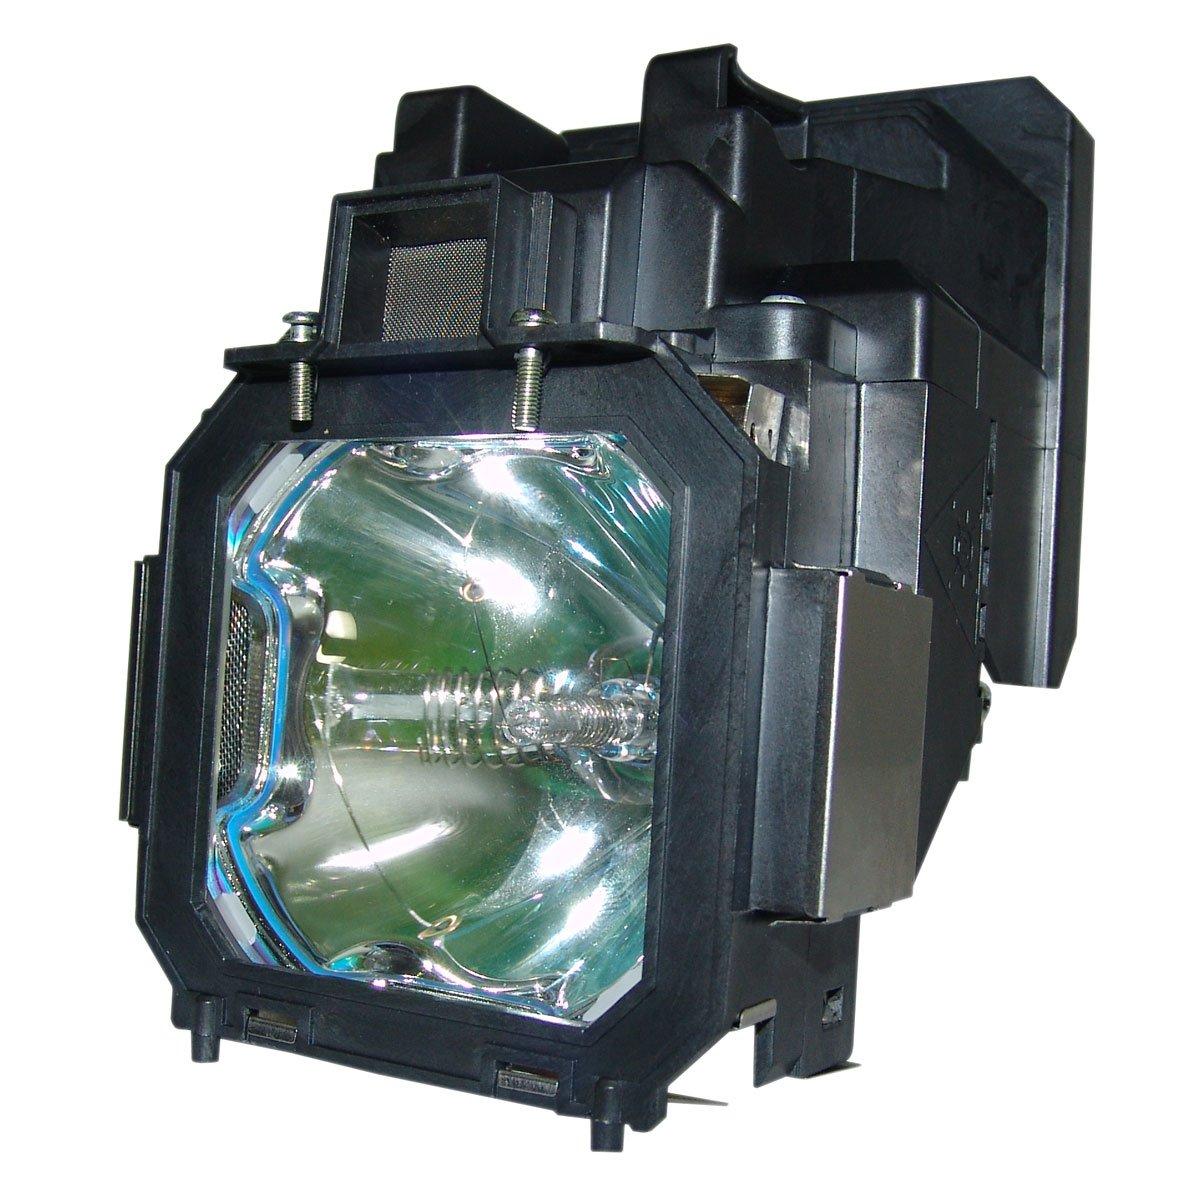 Lutema OEM プロジェクター交換用ランプ ハウジング/電球付き Eiki LC-XG250用 Platinum (Brighter/Durable) Platinum (Brighter/Durable) Lamp with Housing B07KTK5M9Q